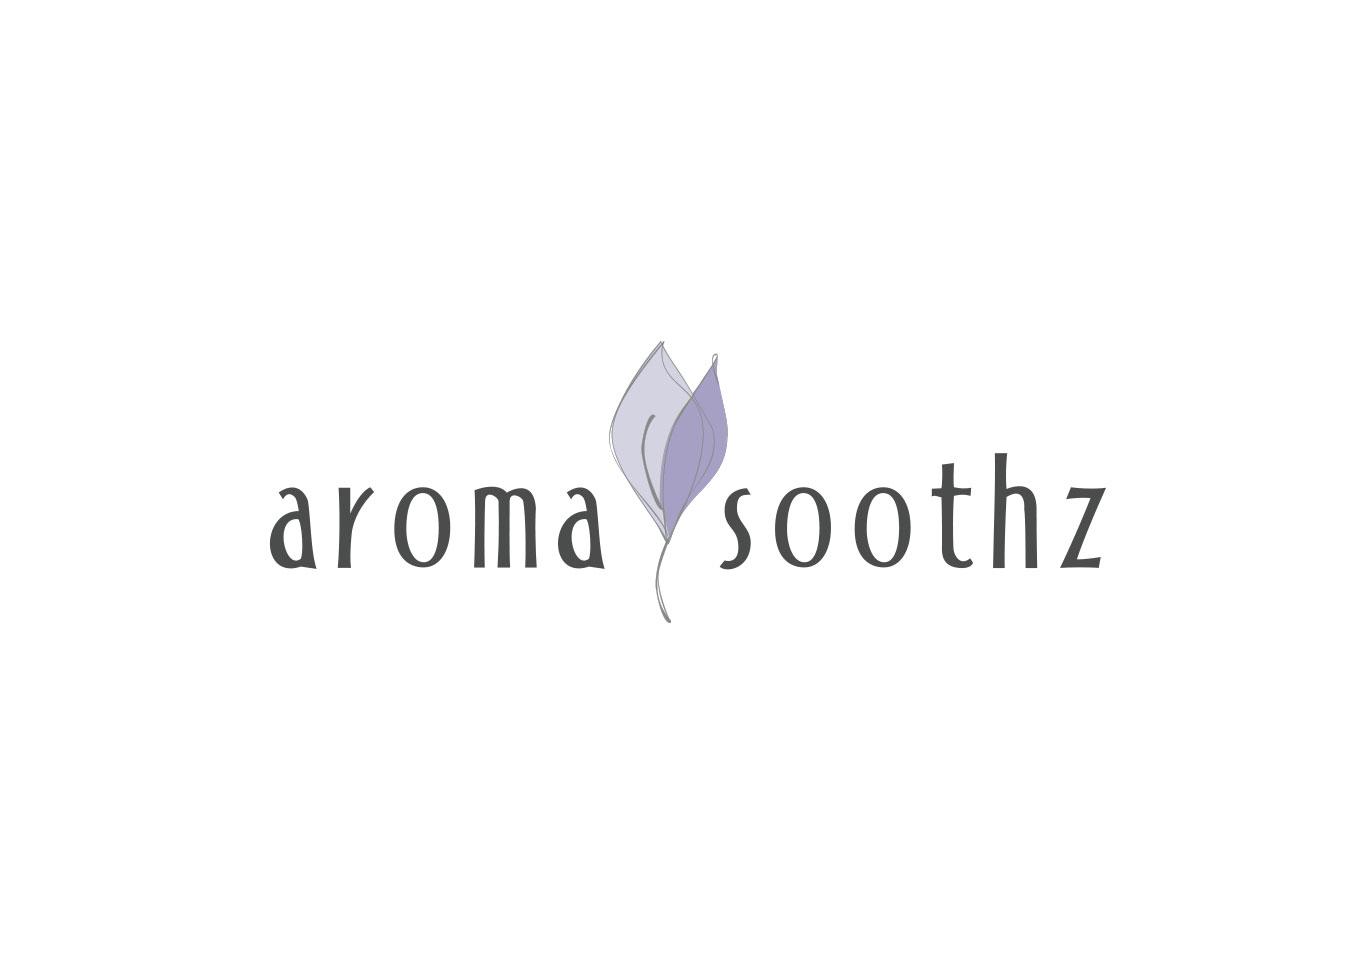 aroma_soothz_logo